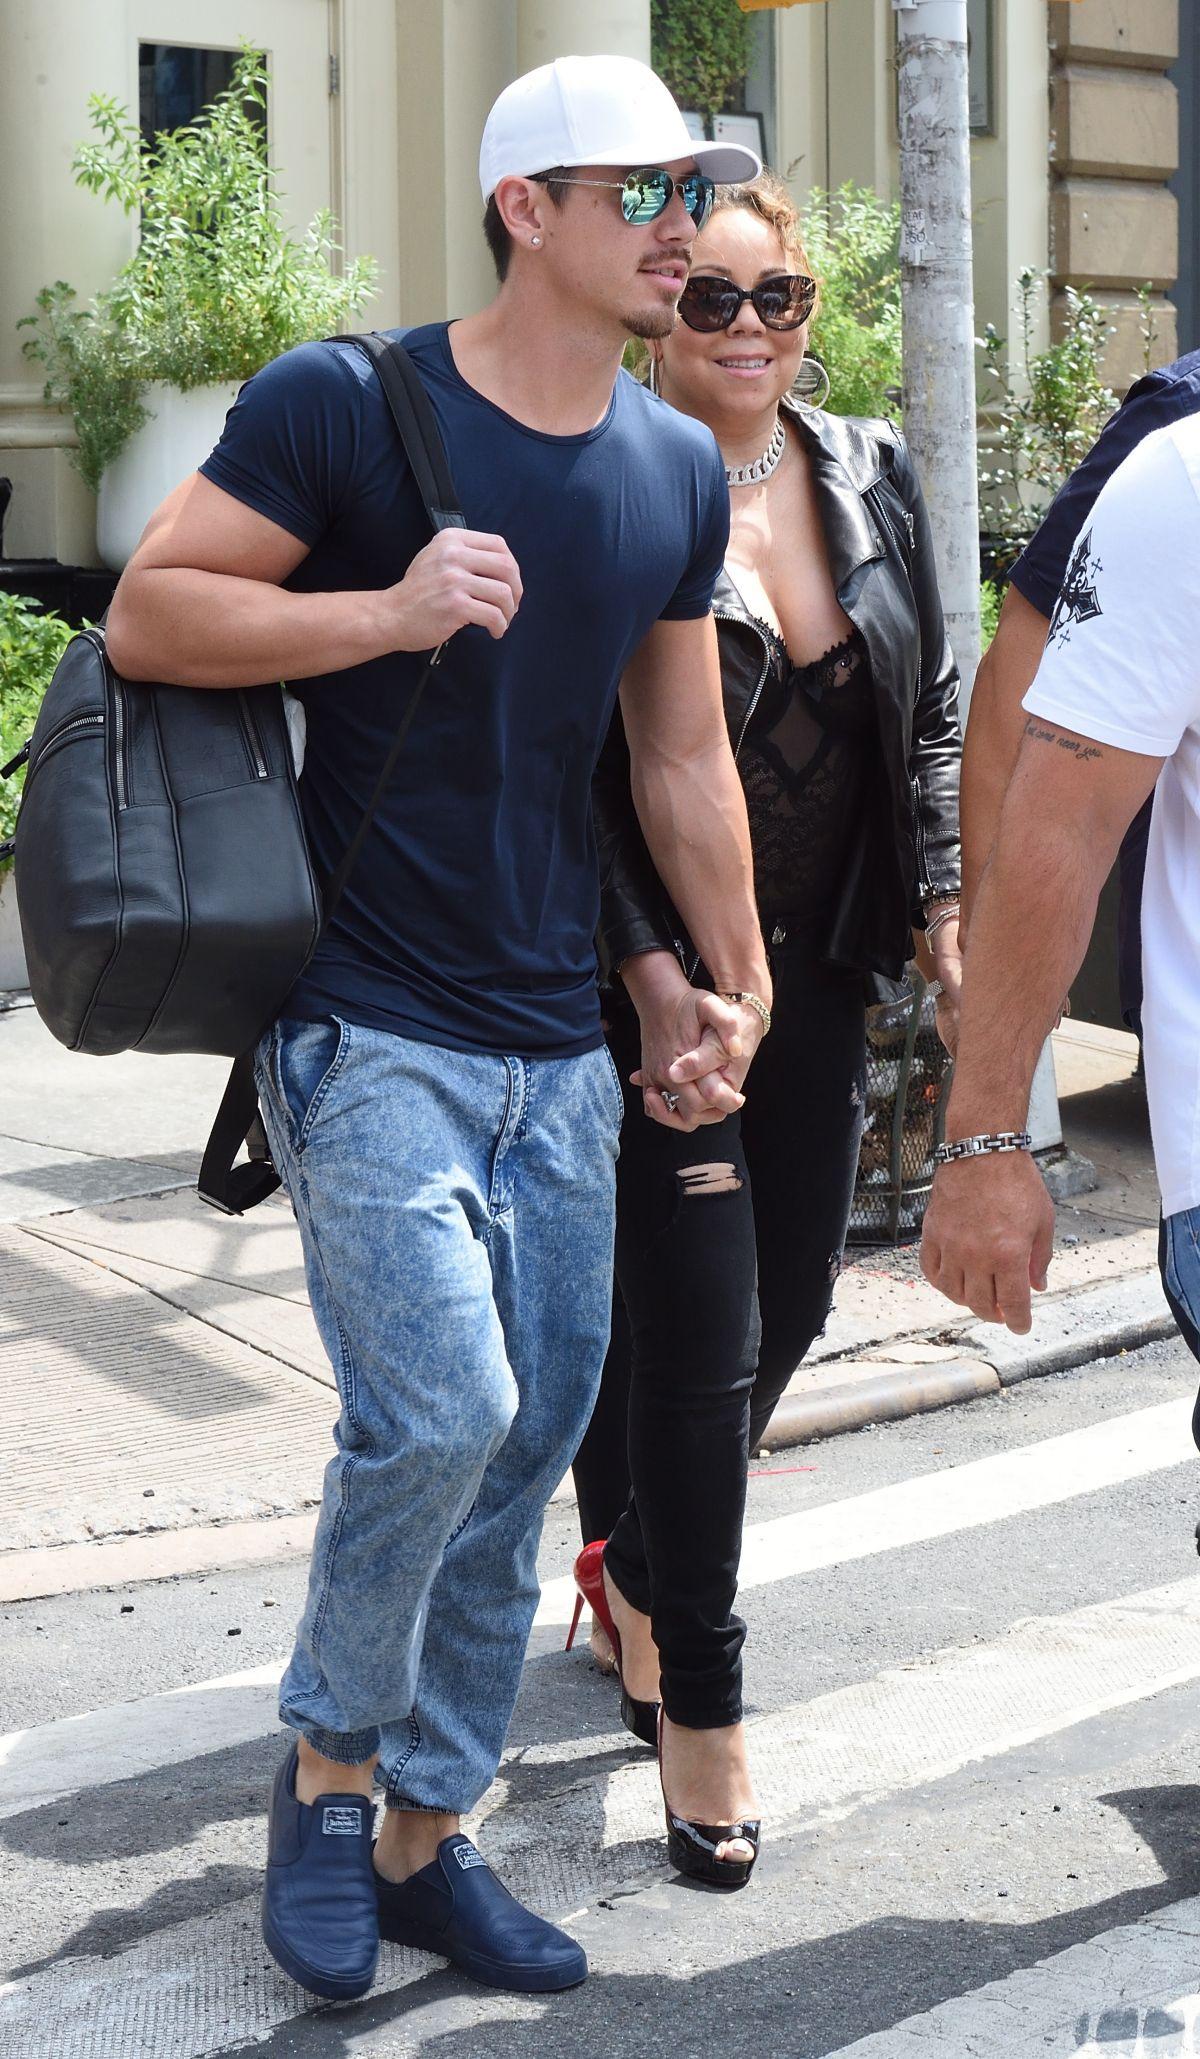 MARIAH CAREY and Bryan Tanaka Out in New York 08 16 2017. MARIAH CAREY and Bryan Tanaka Out in New York 08 16 2017